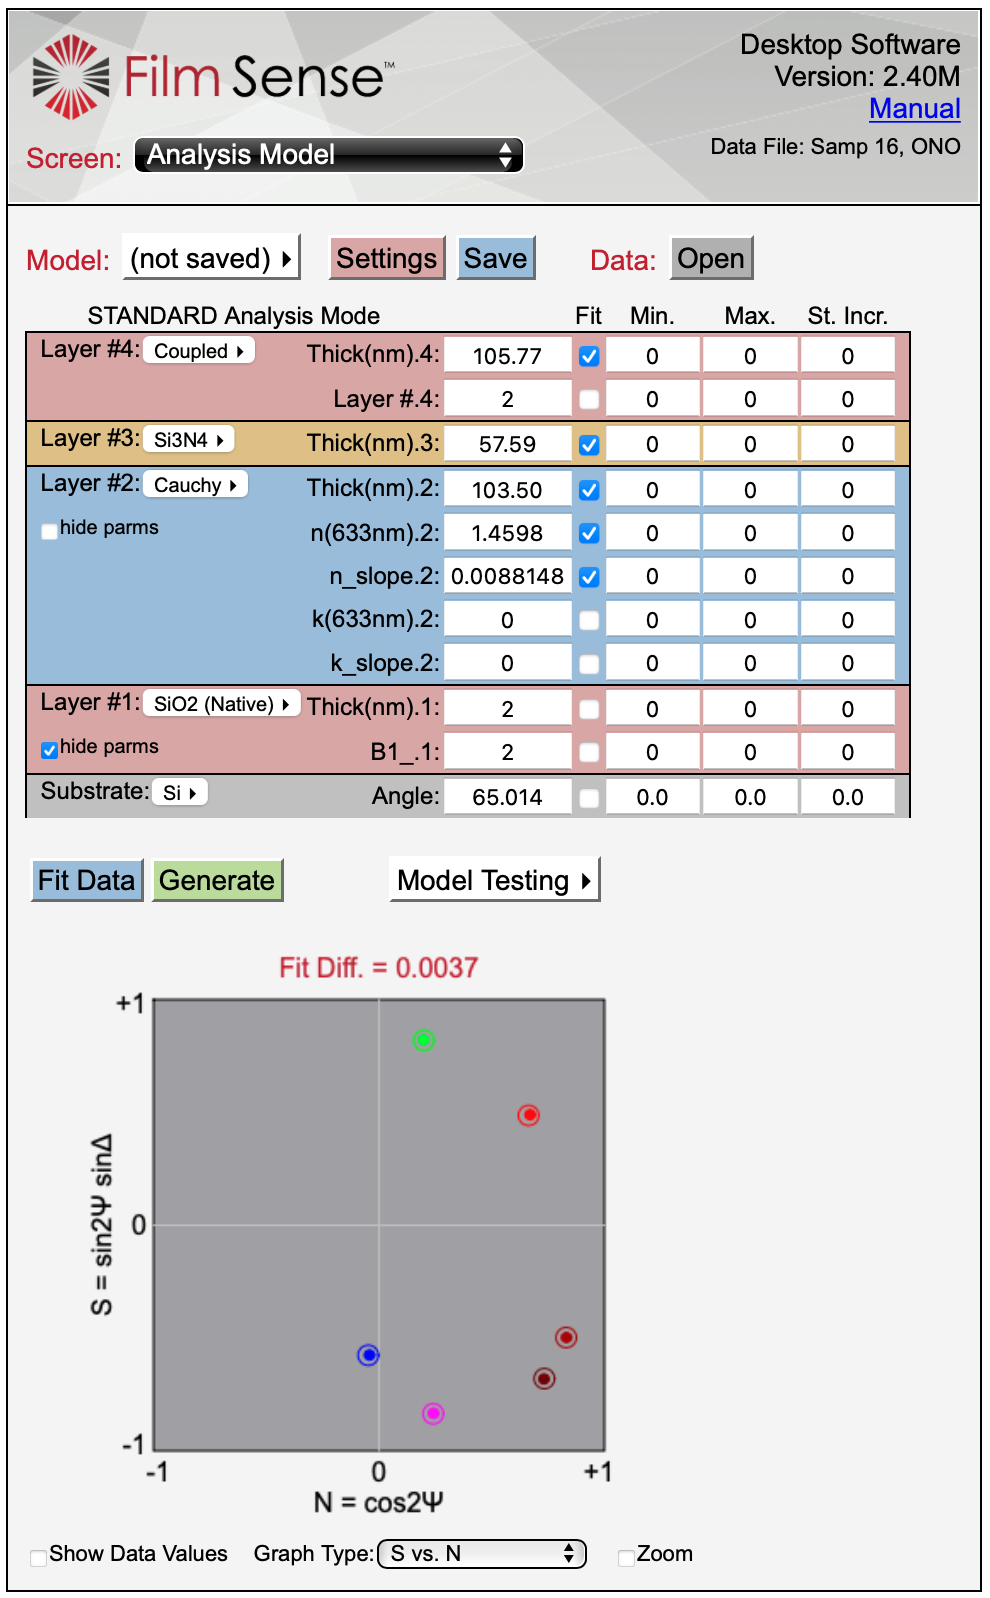 1000 nm Oxide on Si Optical Model-2 - Thin Film Measurement